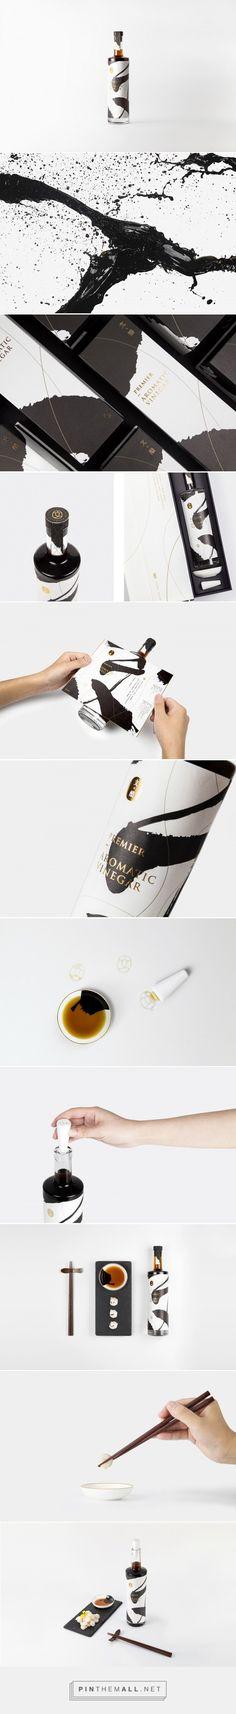 WEN VINEGAR Packaging by Sun Li | Logo Designer Bradenton, Web Design Sarasota, Tampa Fivestar Branding Agency #vinegar #food #foodpackaging #packaging #packagingdesign #packaginginspiration #package #packagedesign #design